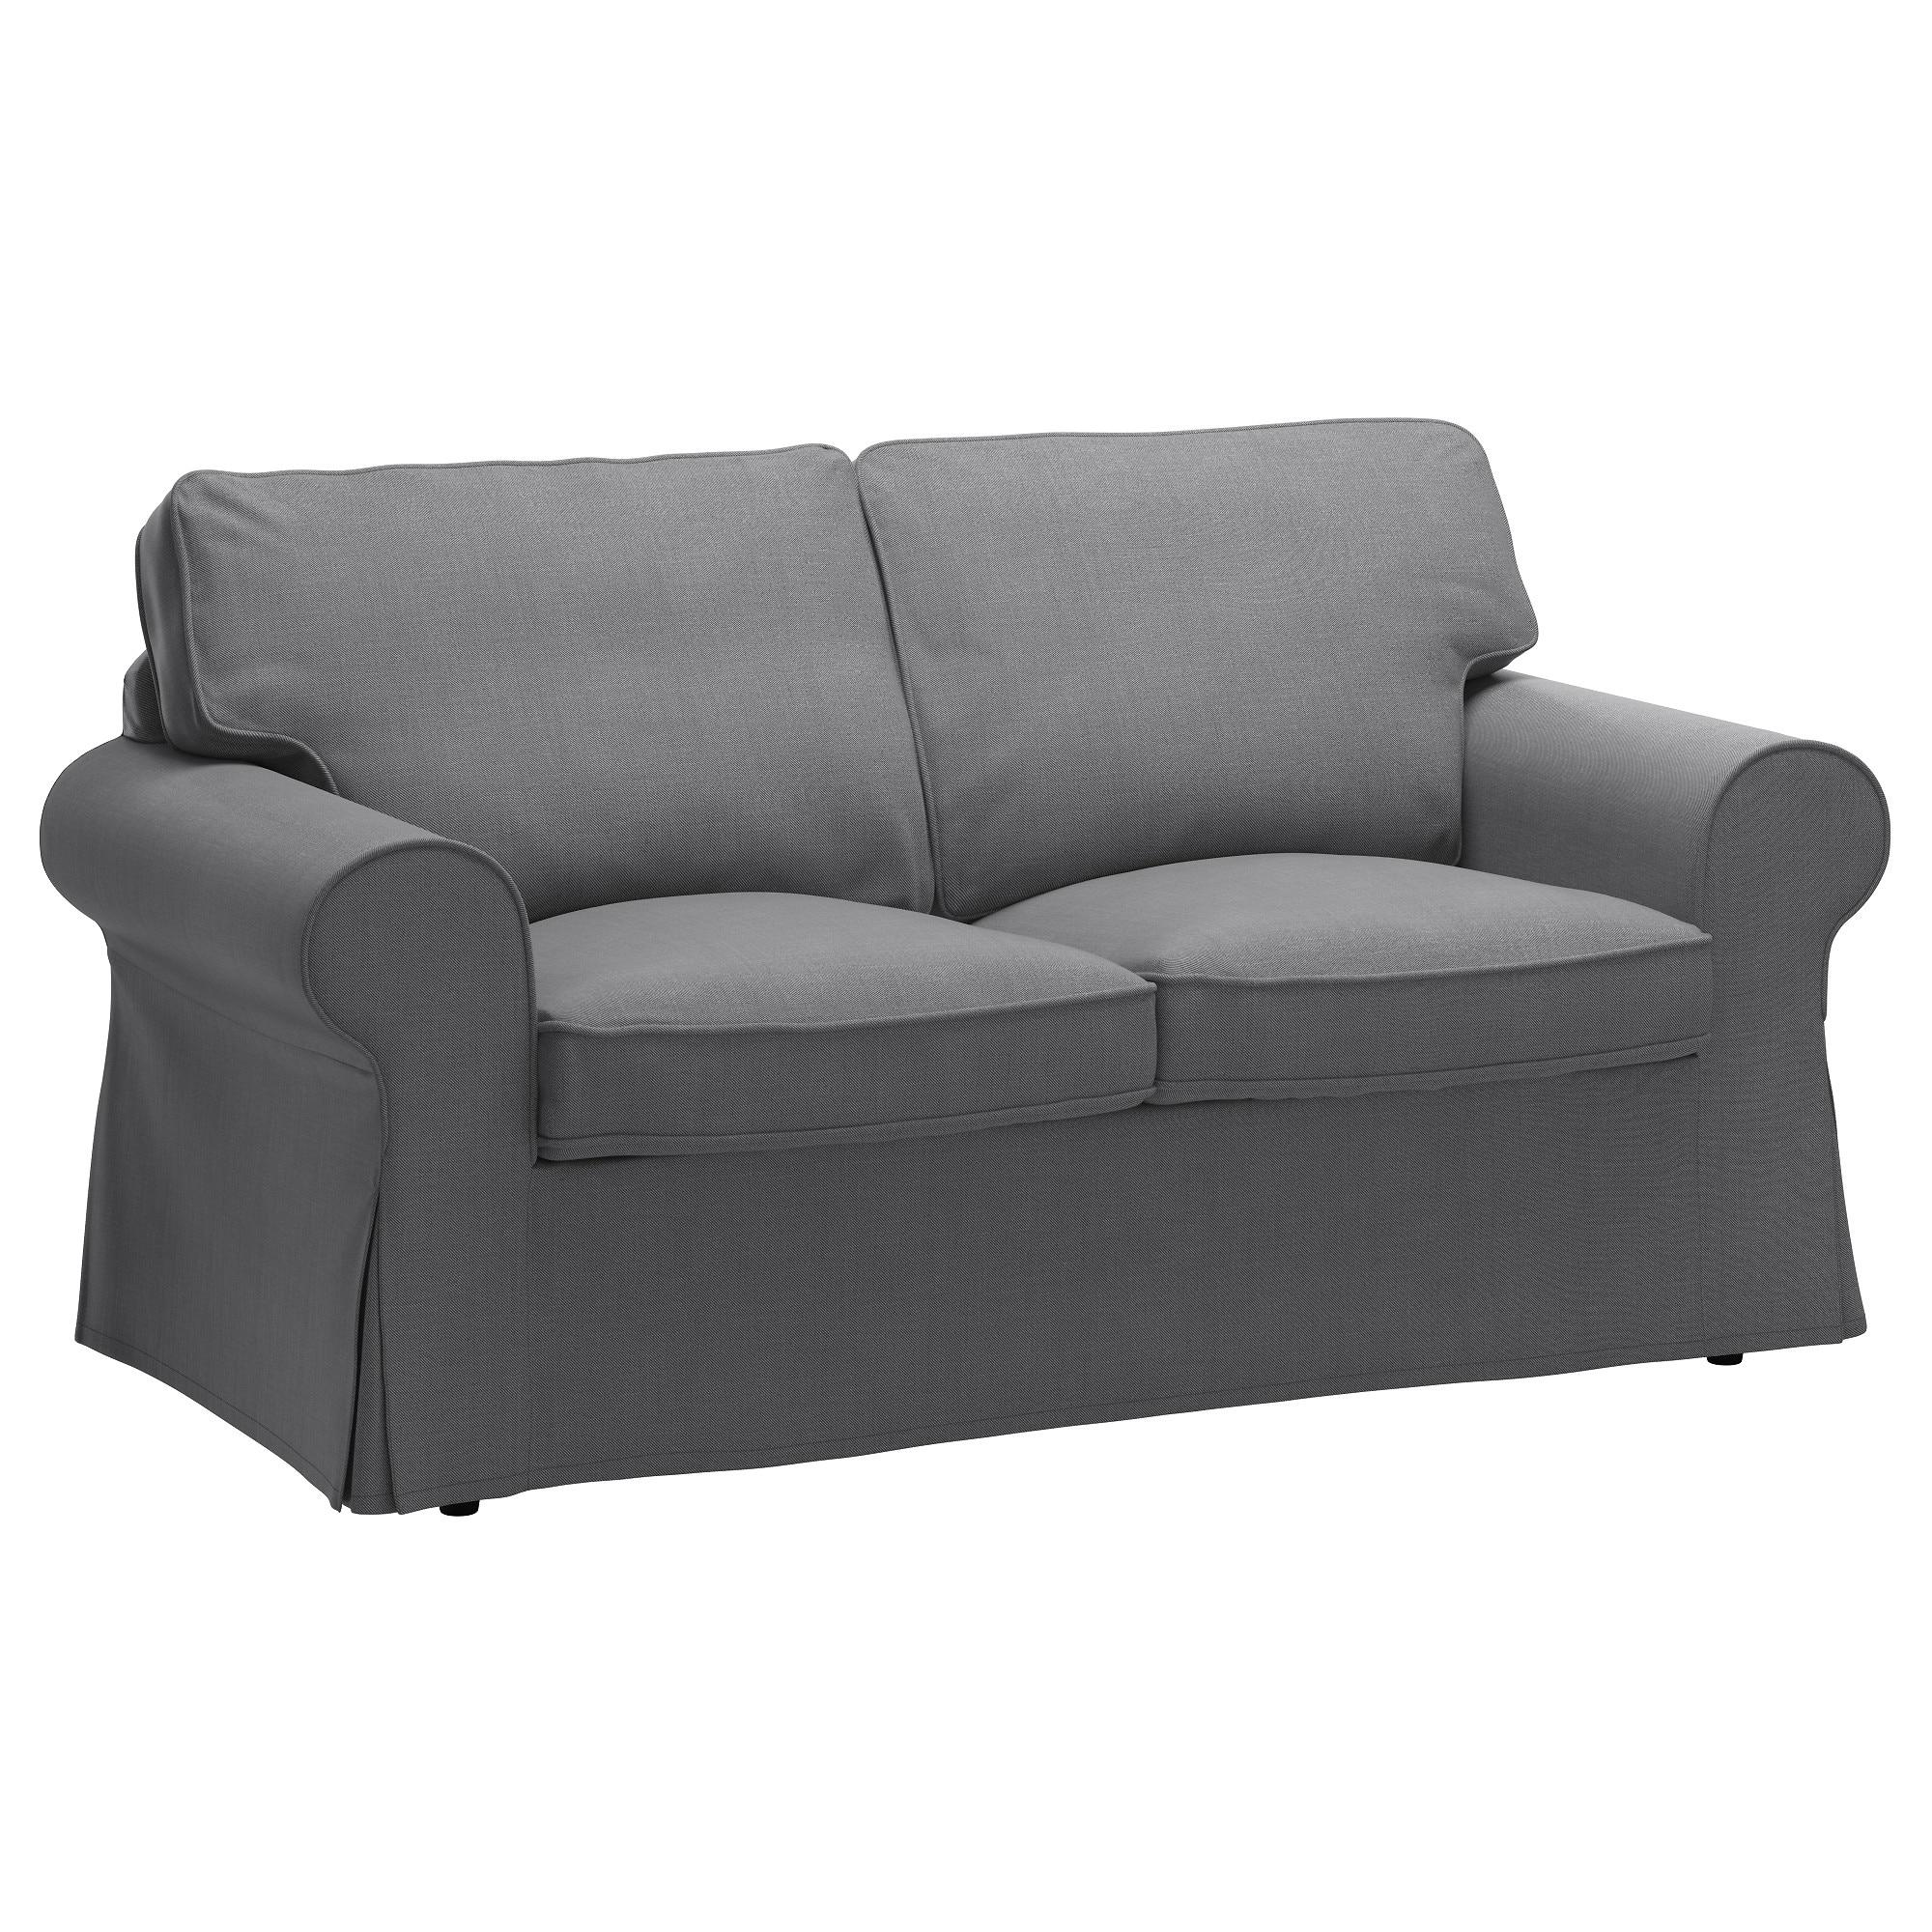 Recent Ektorp Two Seat Sofa Nordvalla Dark Grey – Ikea Intended For Ikea Sofa Chairs (View 12 of 20)